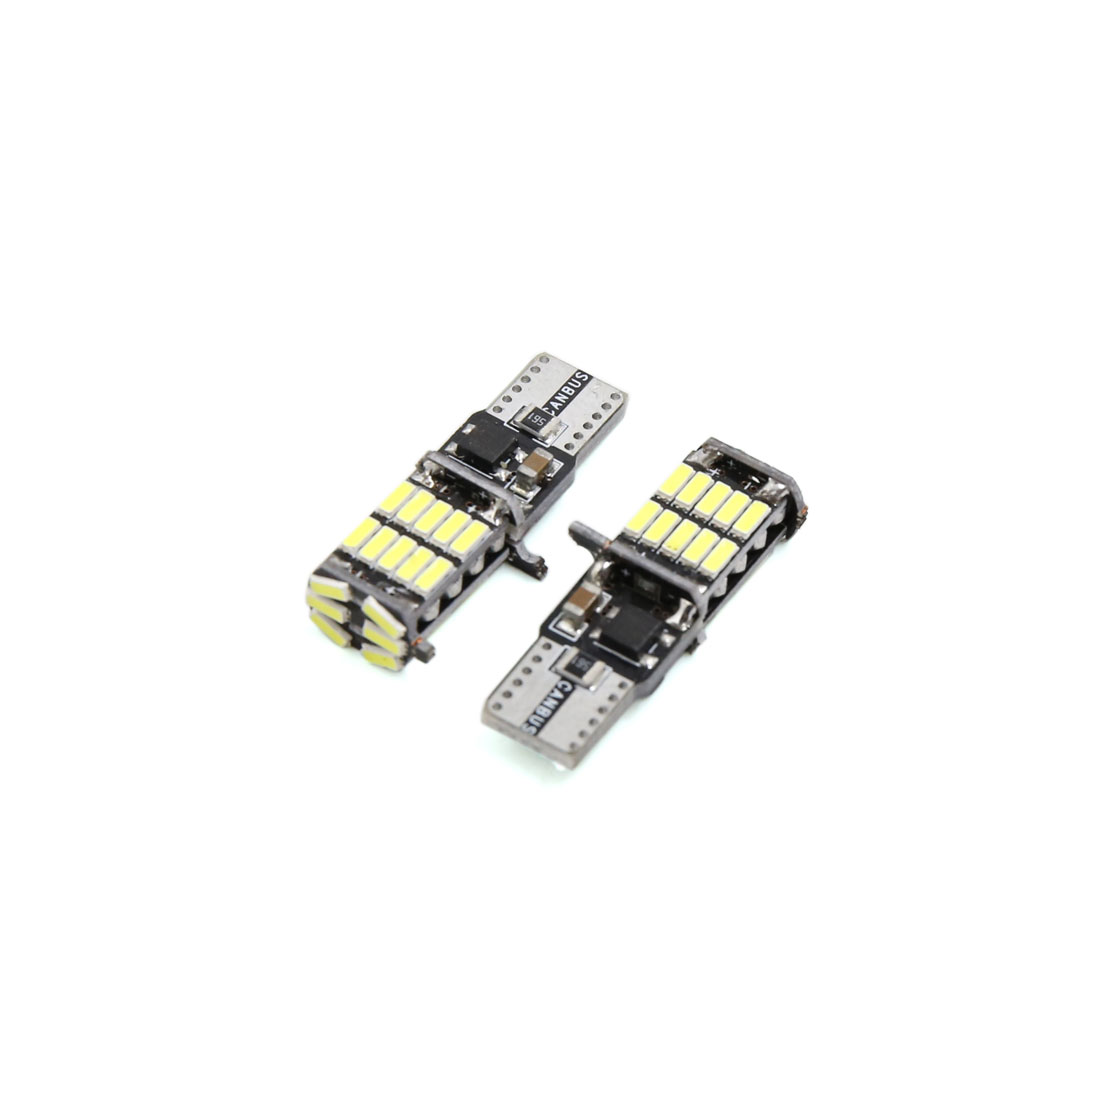 2Pcs T10 Canbus White 26 4010-SMD LED Car Panel Light Interior W5W 2825 158 192 194